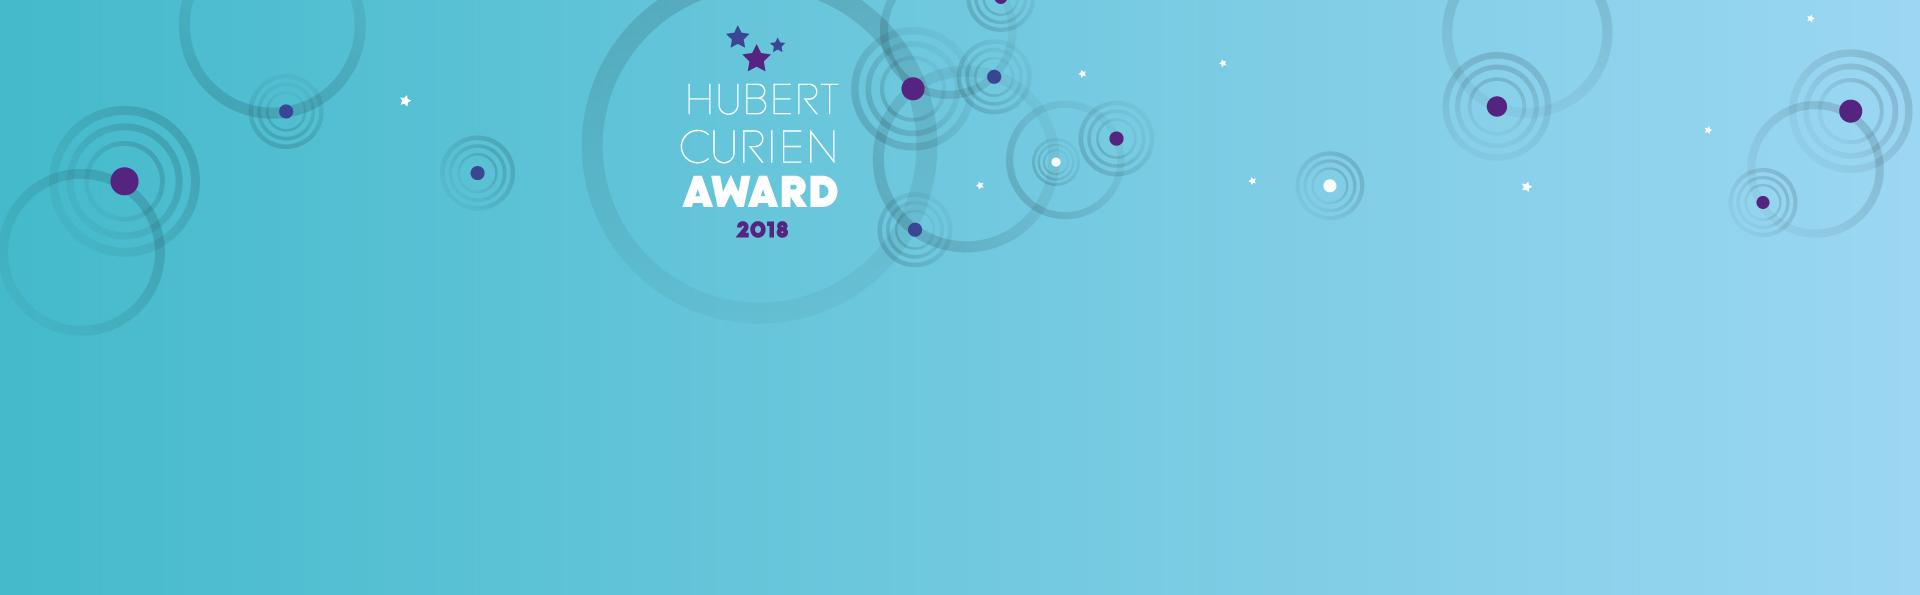 The Hubert Curien Award 2016